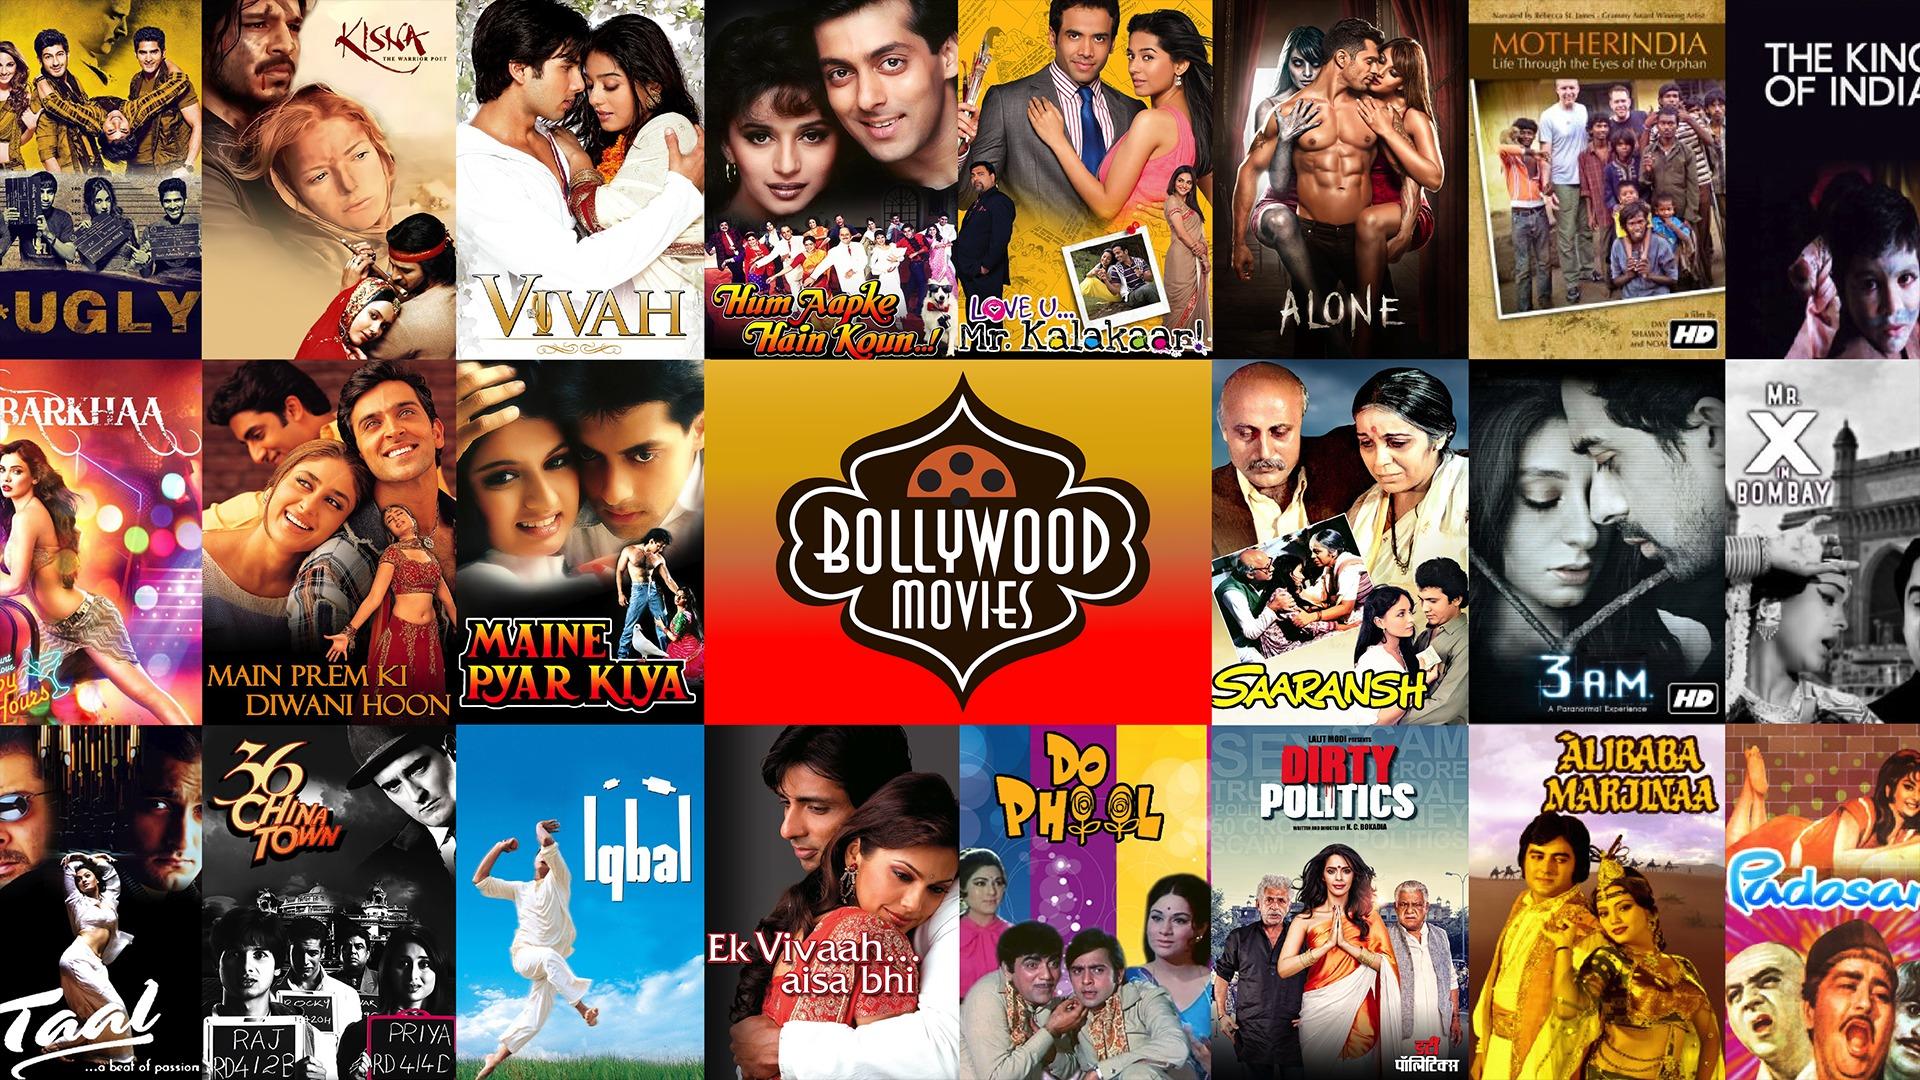 Movieswood 2021 Website - Tamil, Telugu, Malayalam Movies Download - Is it safe?